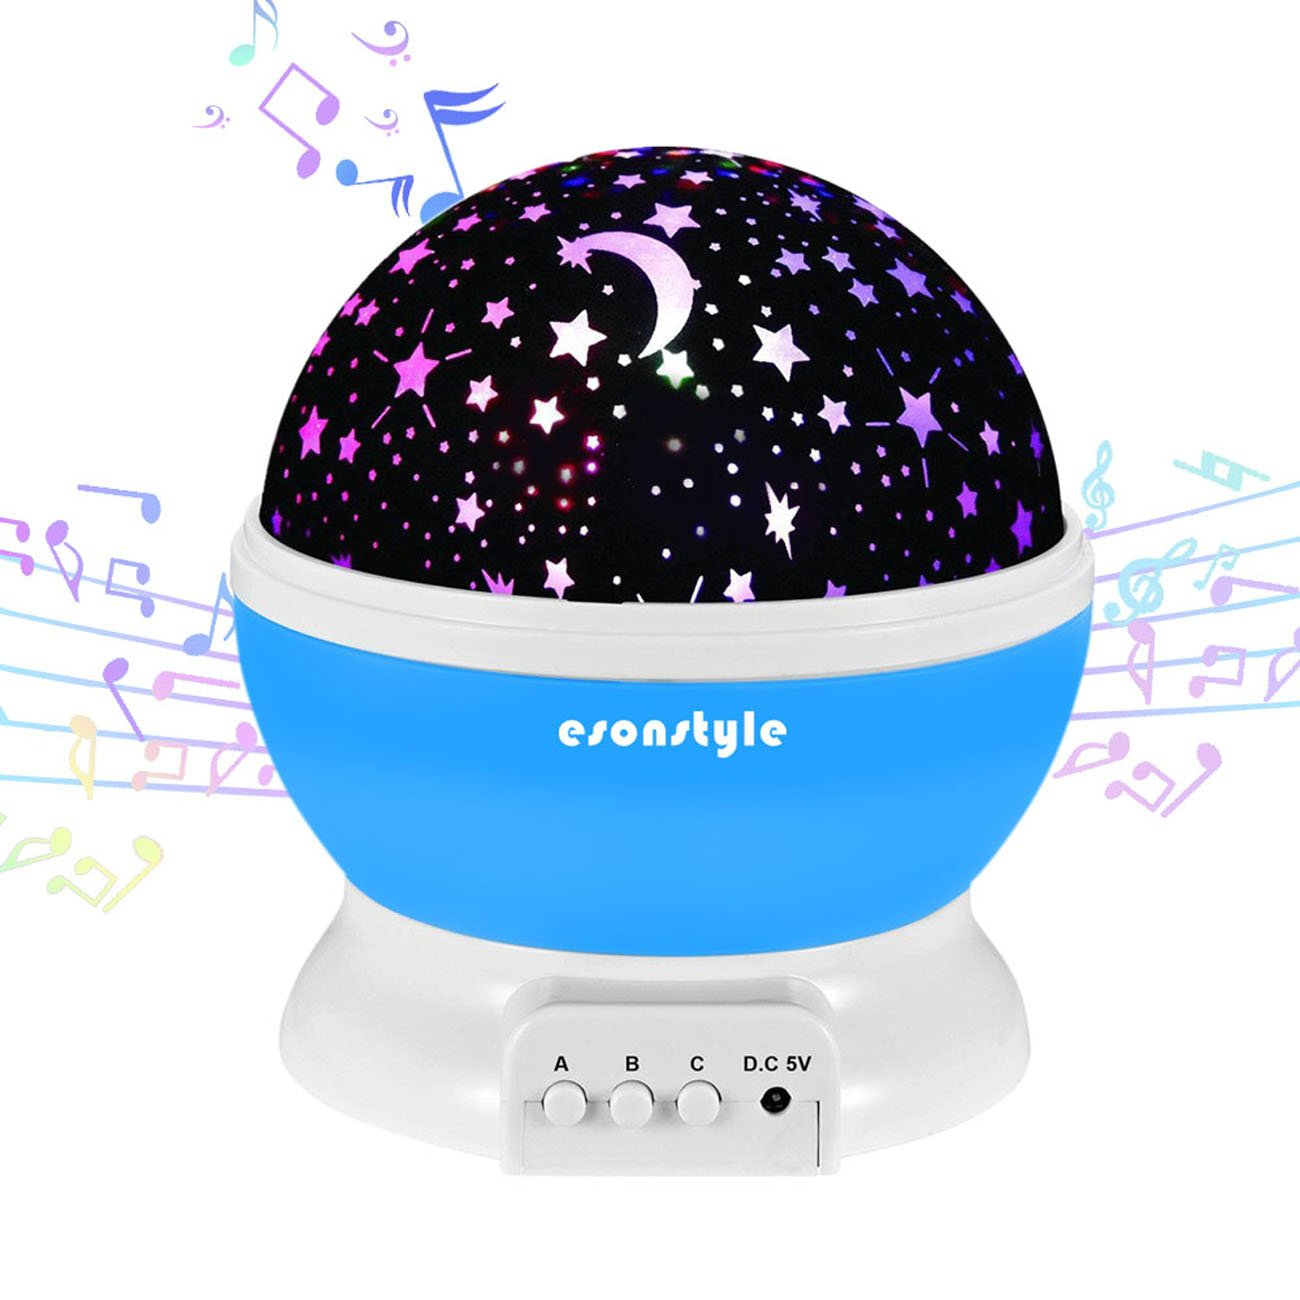 Esonstyle Recargable de Grados Luz nocturna Giratoria Lámpara Proyector Lámpara Musical Del